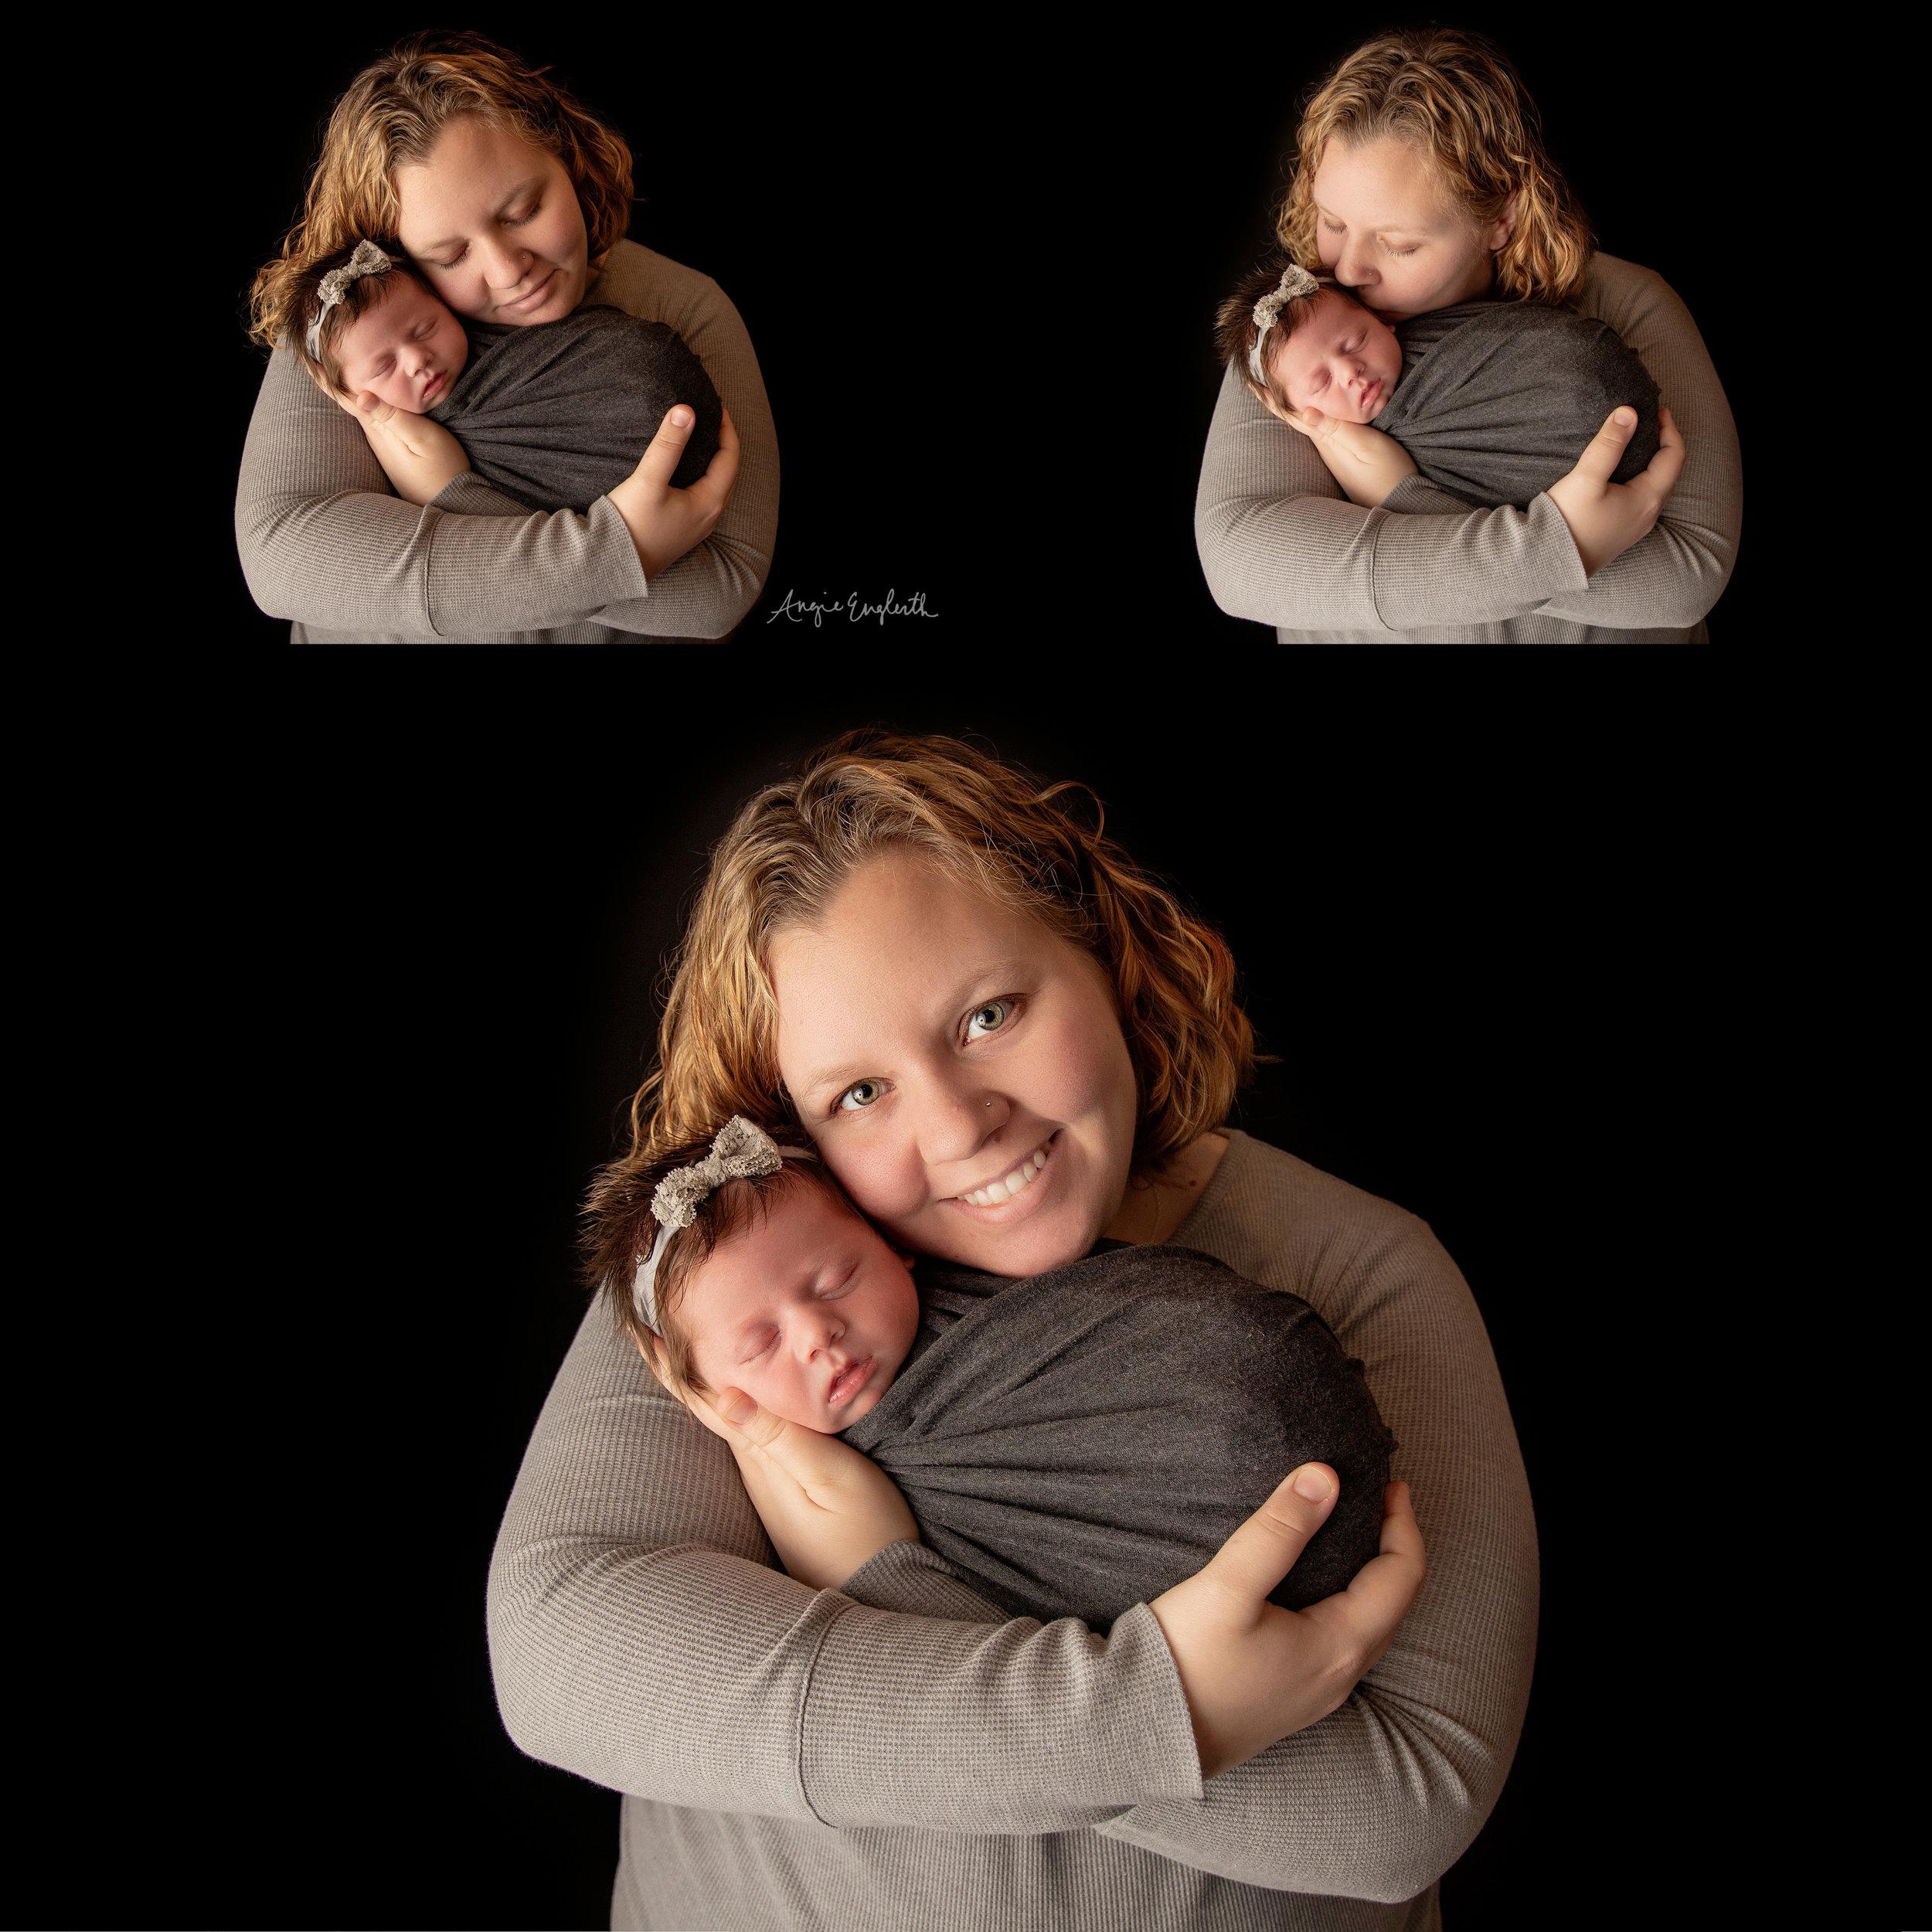 Lancaster_Newborn_Photographer_Angie_Englerth_Jenna_010.jpg